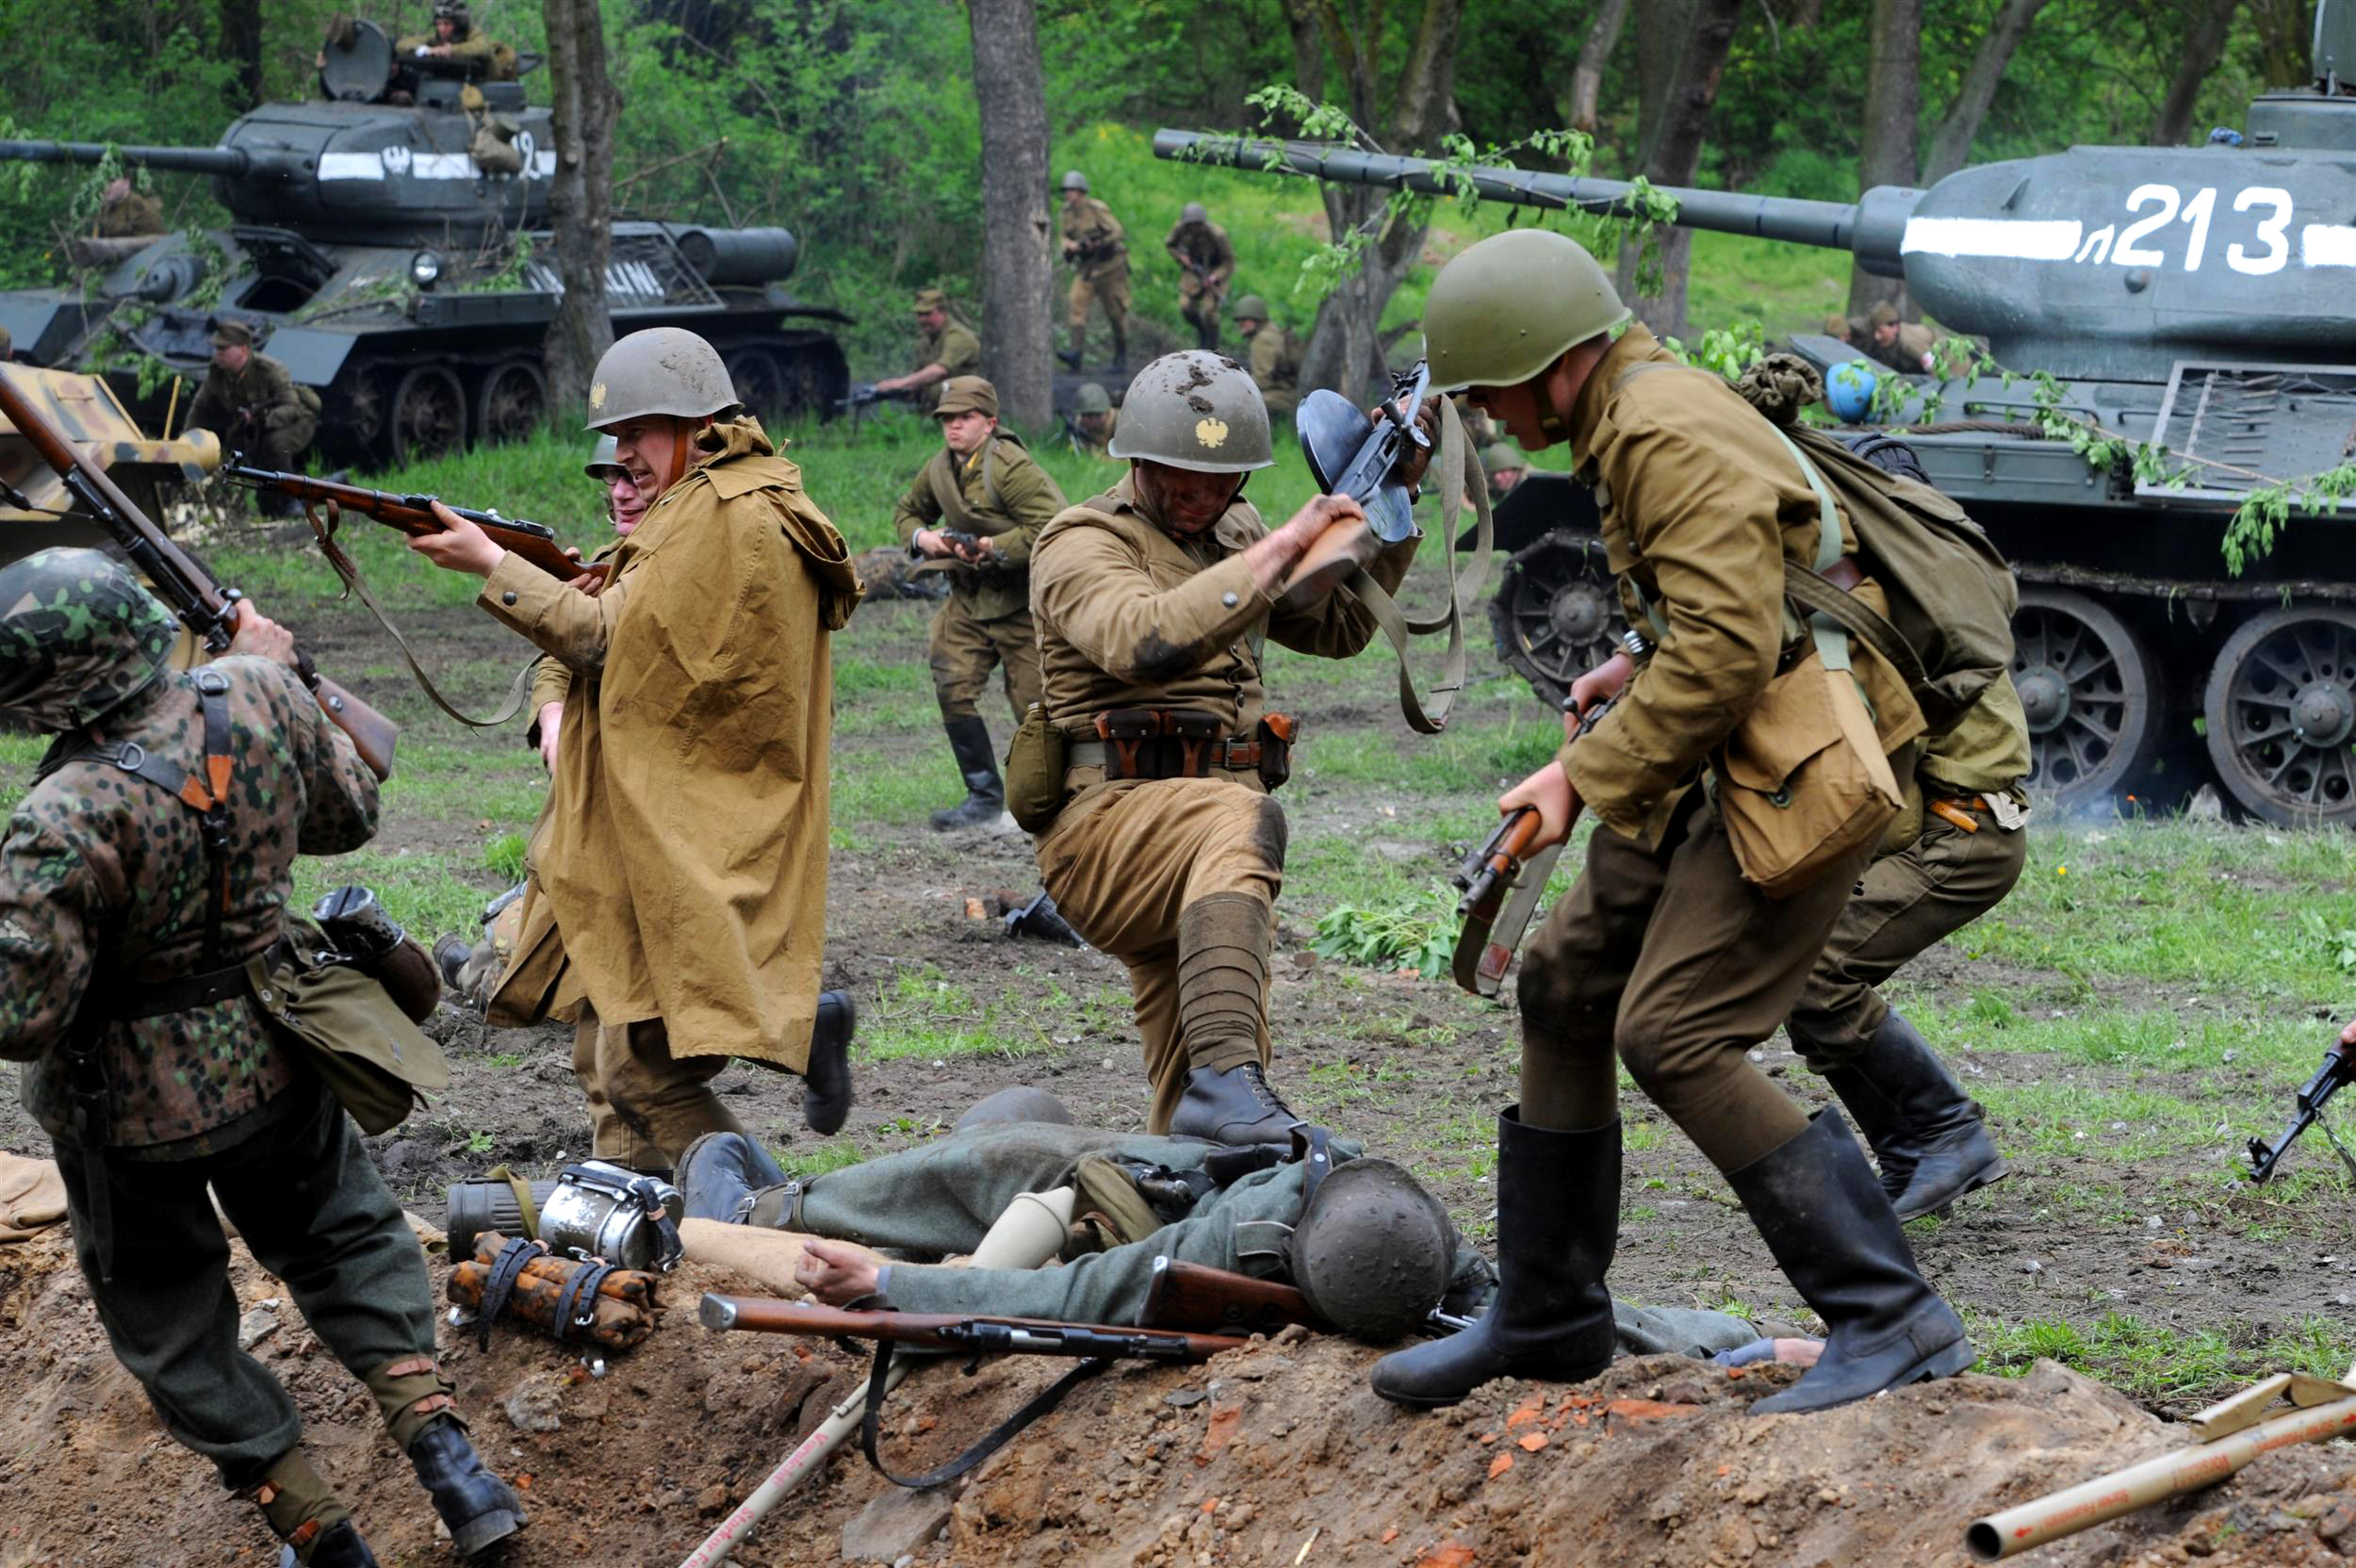 World War II reenactment - Wikipedia